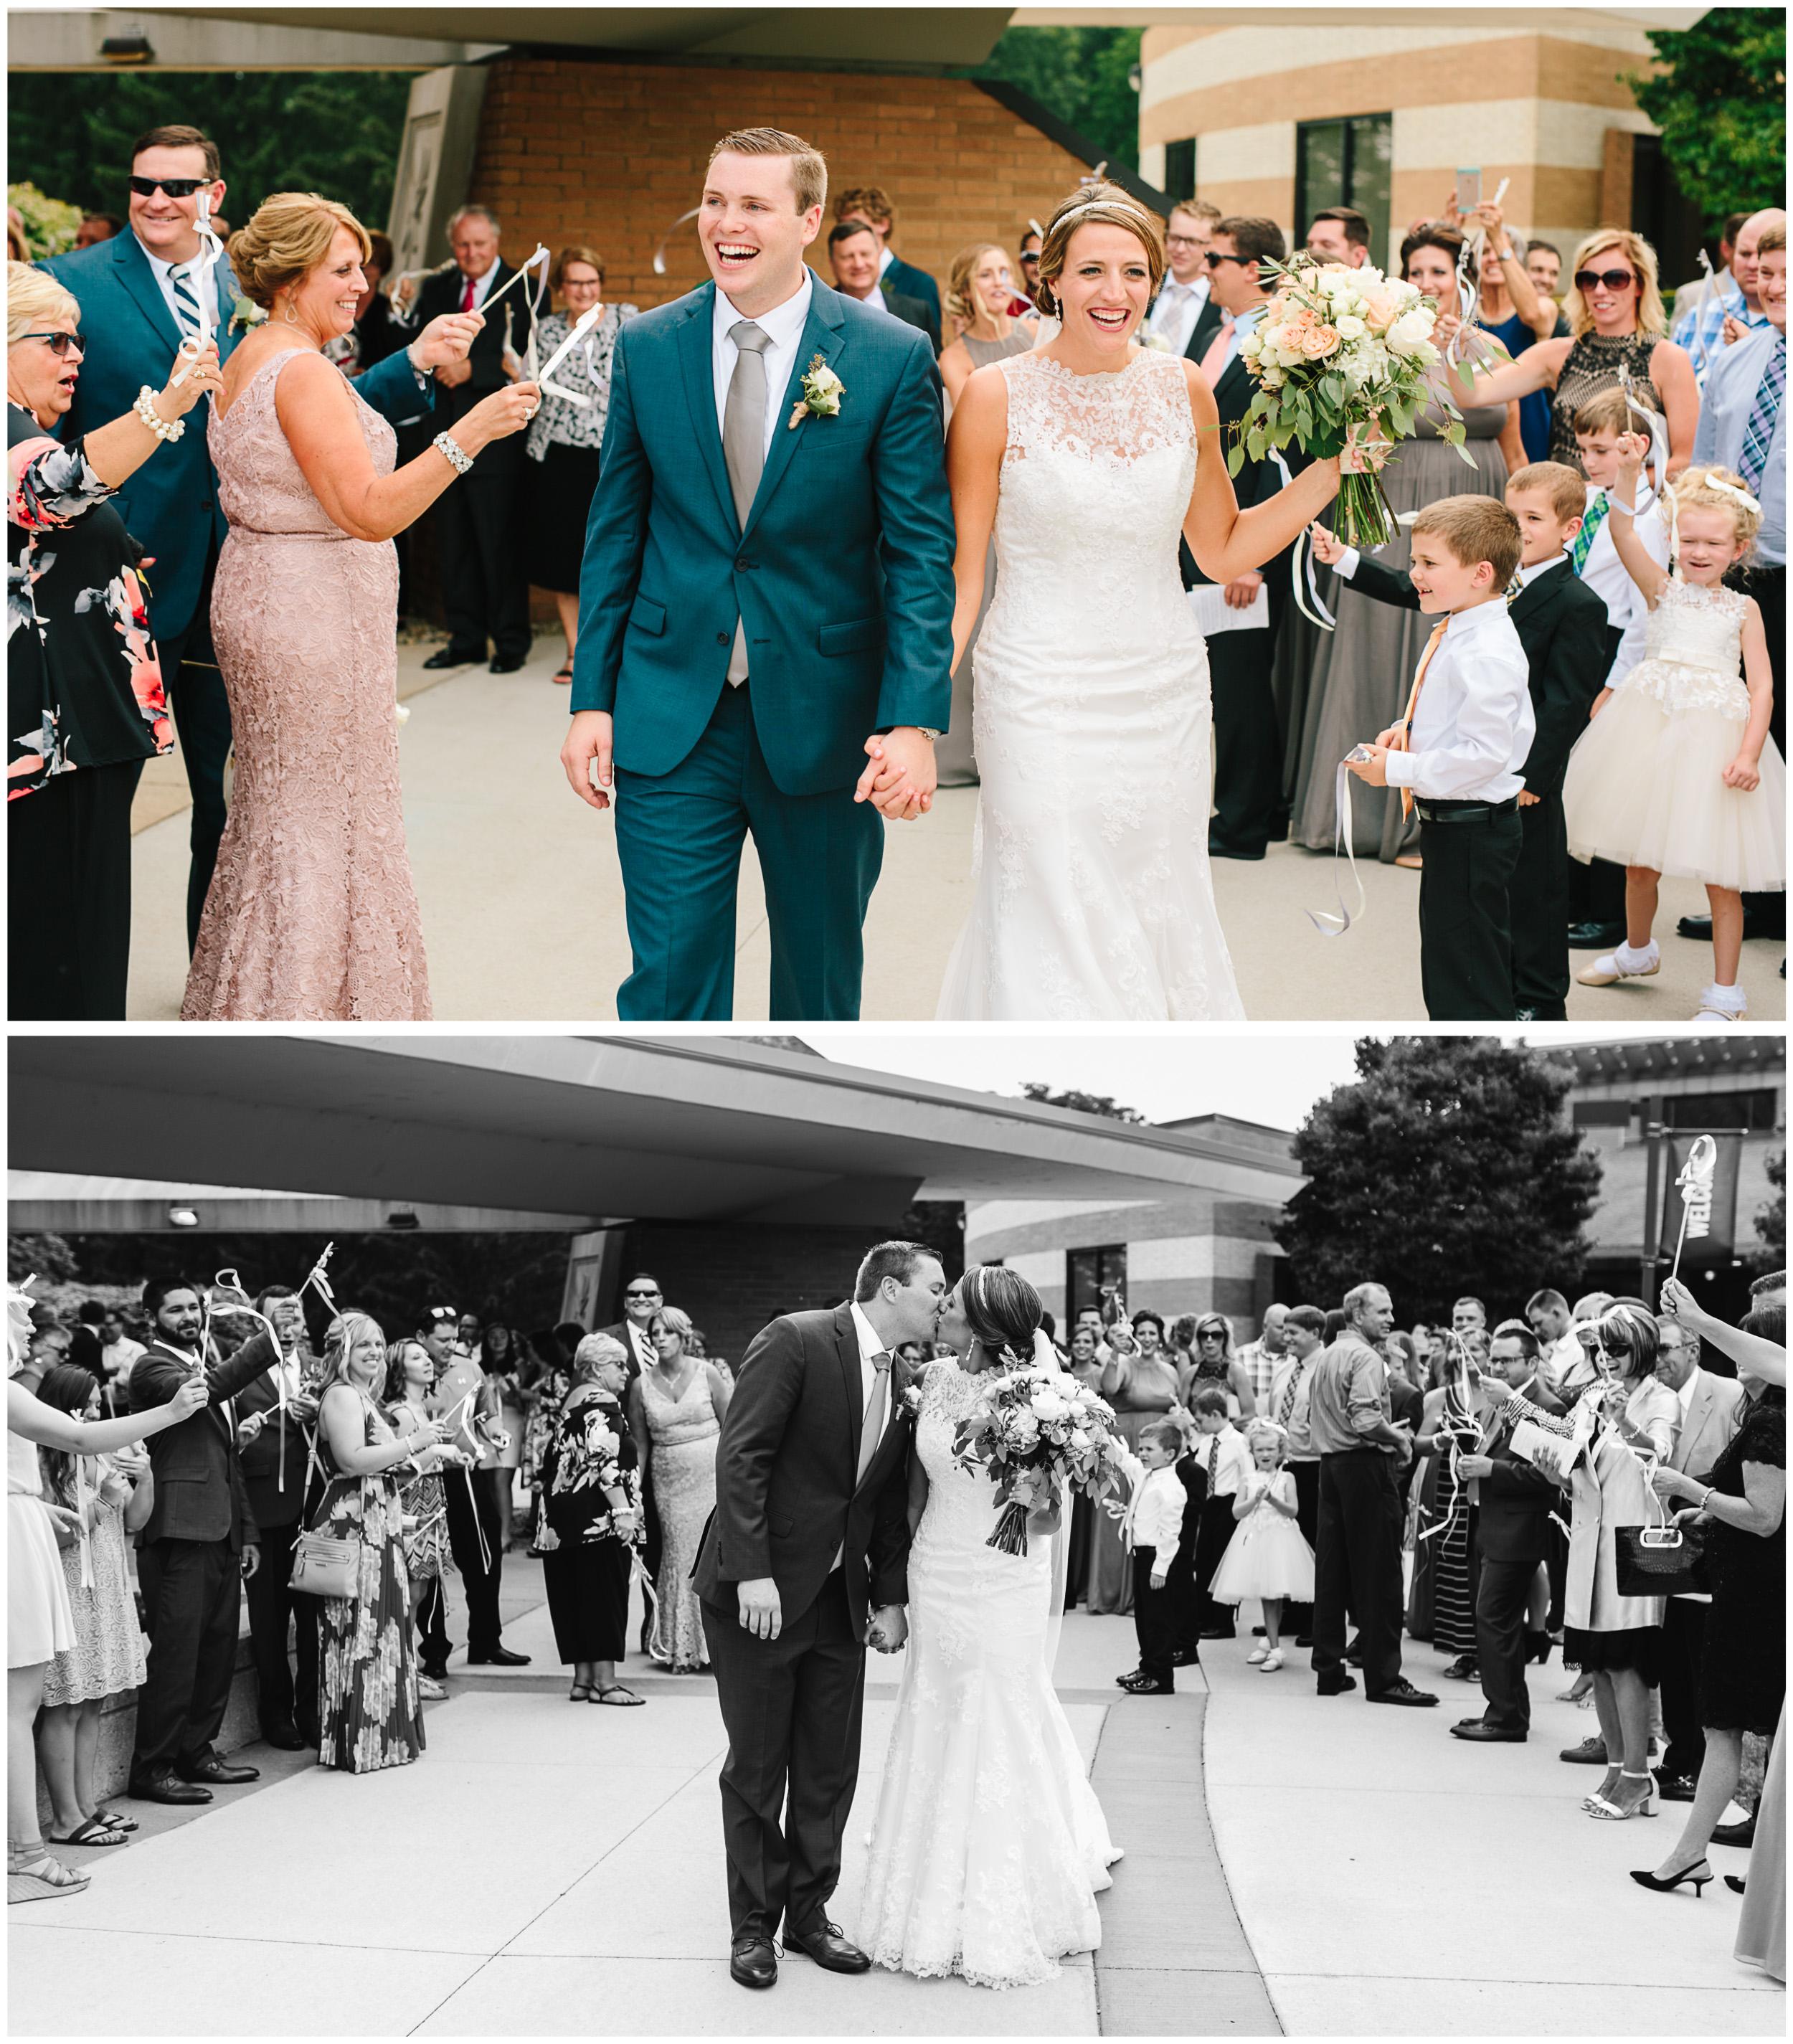 ann_arbor_michigan_wedding_71.jpg